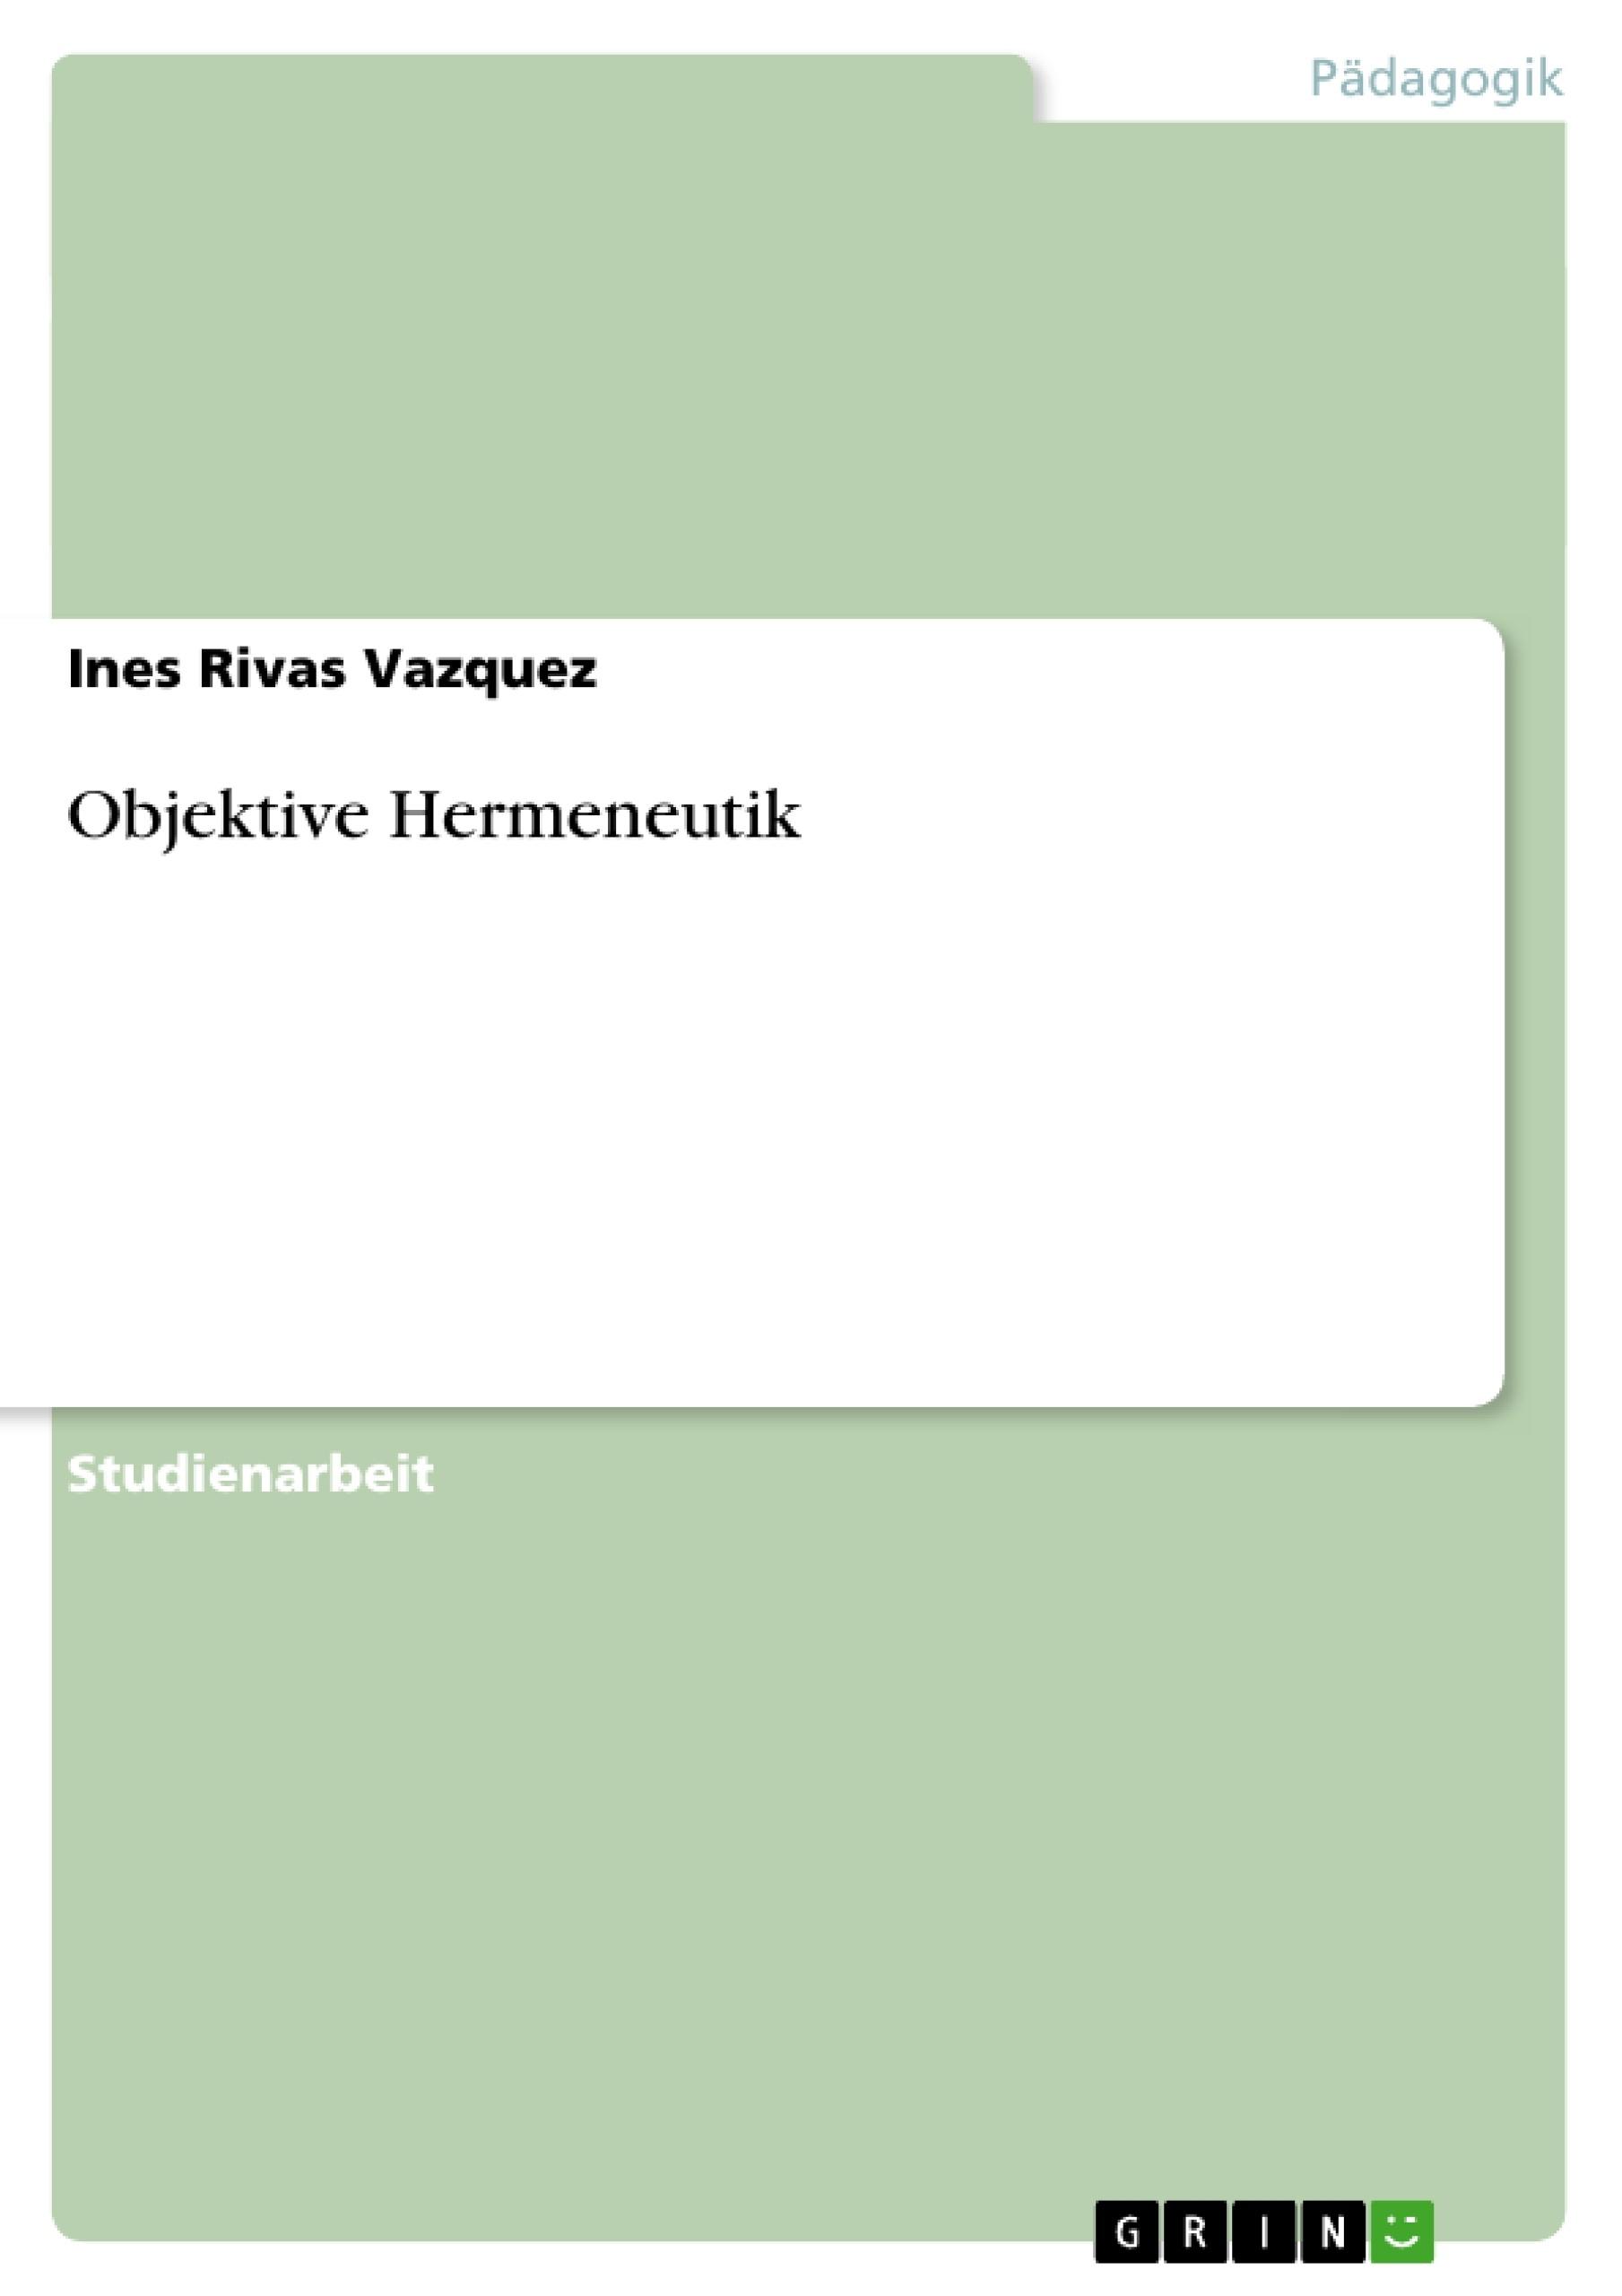 Titel: Objektive Hermeneutik